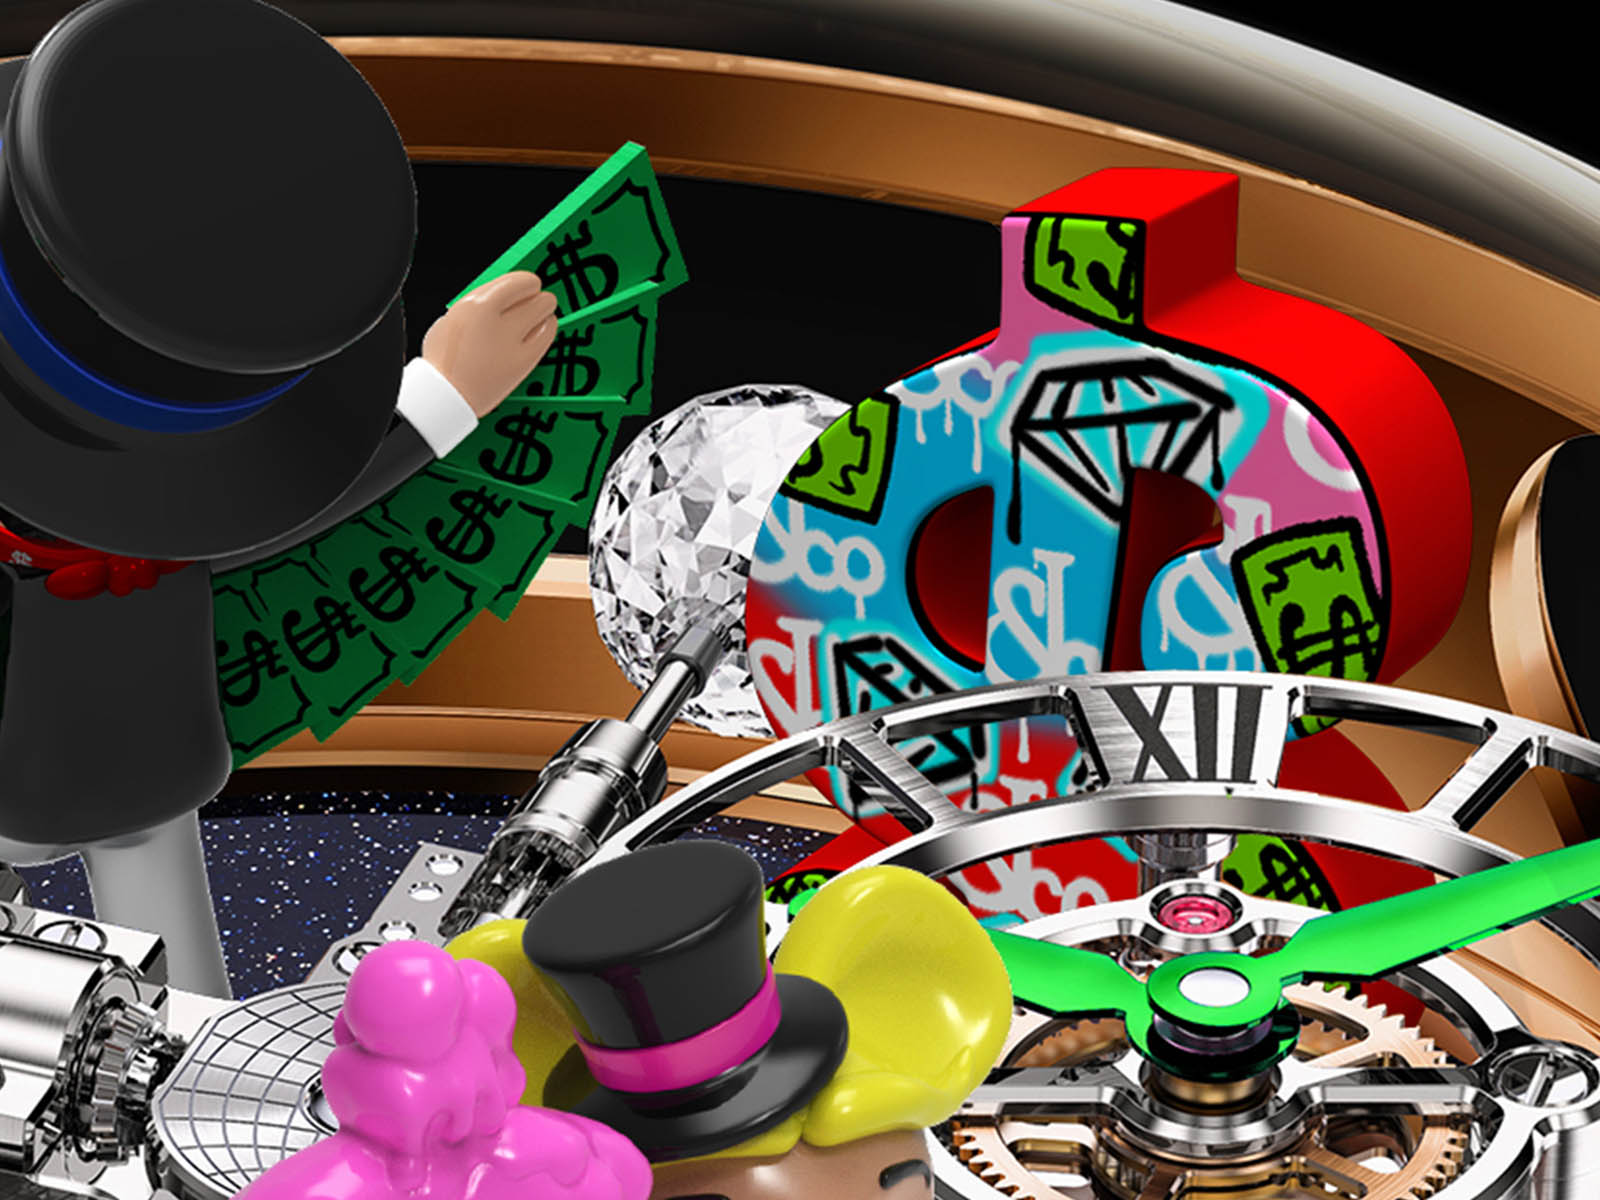 jacob-co-astronomia-alec-monopoly-6.jpg